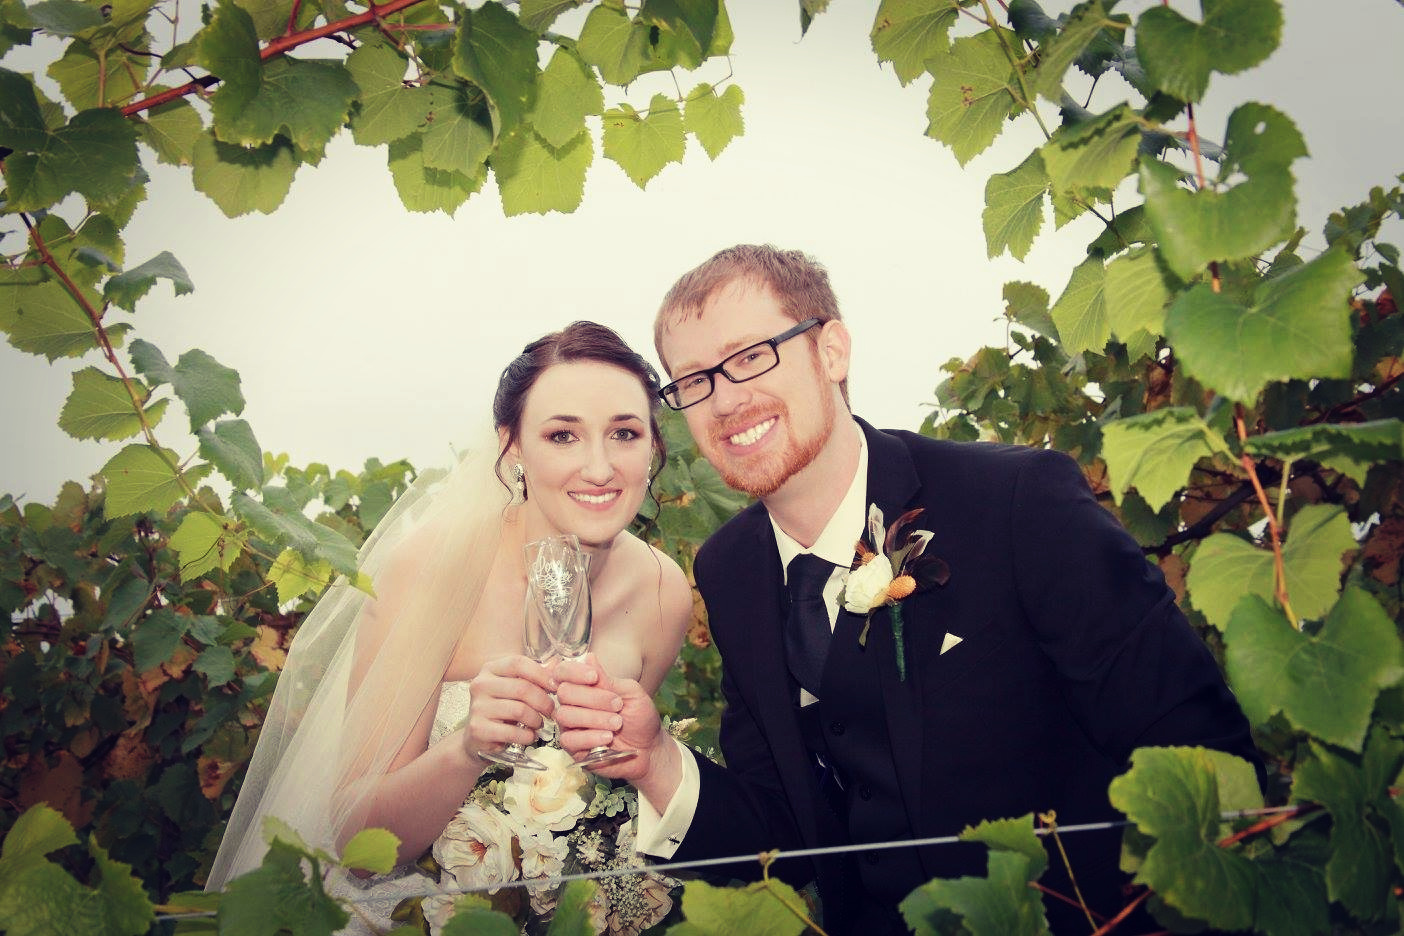 wedding BG 10.14.17 3.jpg